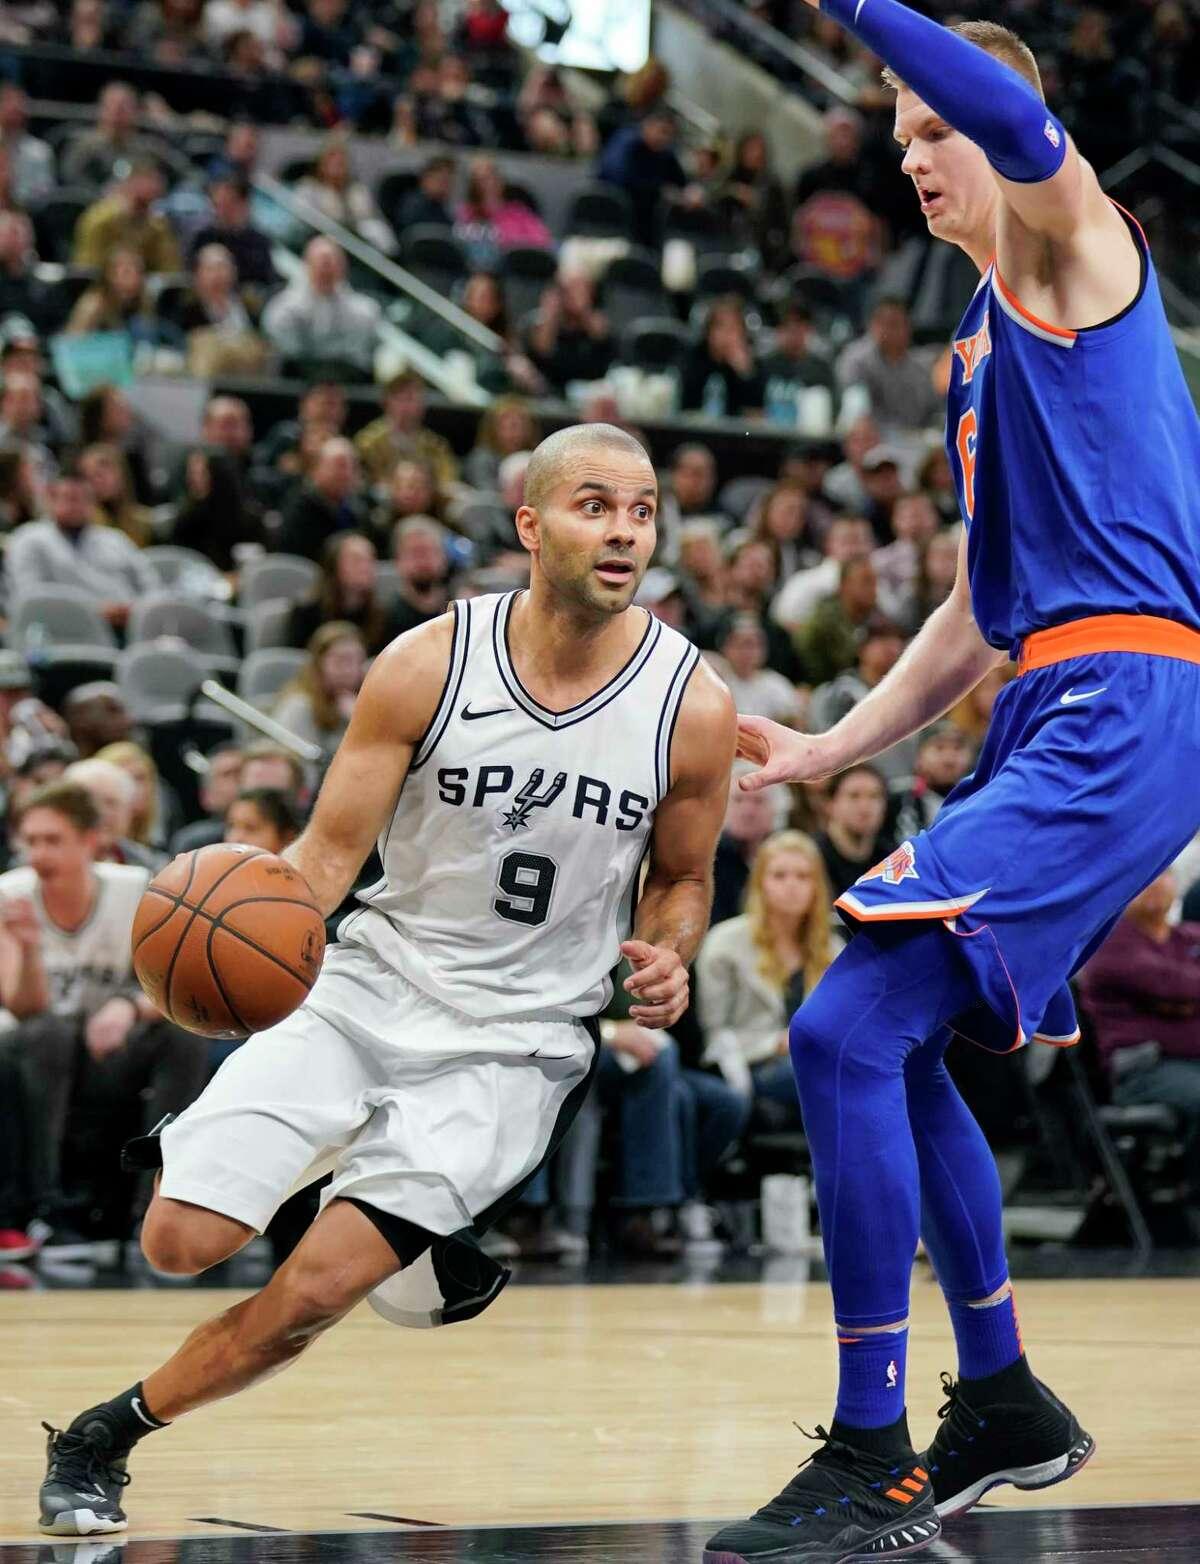 San Antonio Spurs guard Tony Parker (9) drives around New York Knicks' Kristaps Porzingis during the second half of an NBA basketball game, Thursday, Dec. 28, 2017, in San Antonio. (AP Photo/Darren Abate)